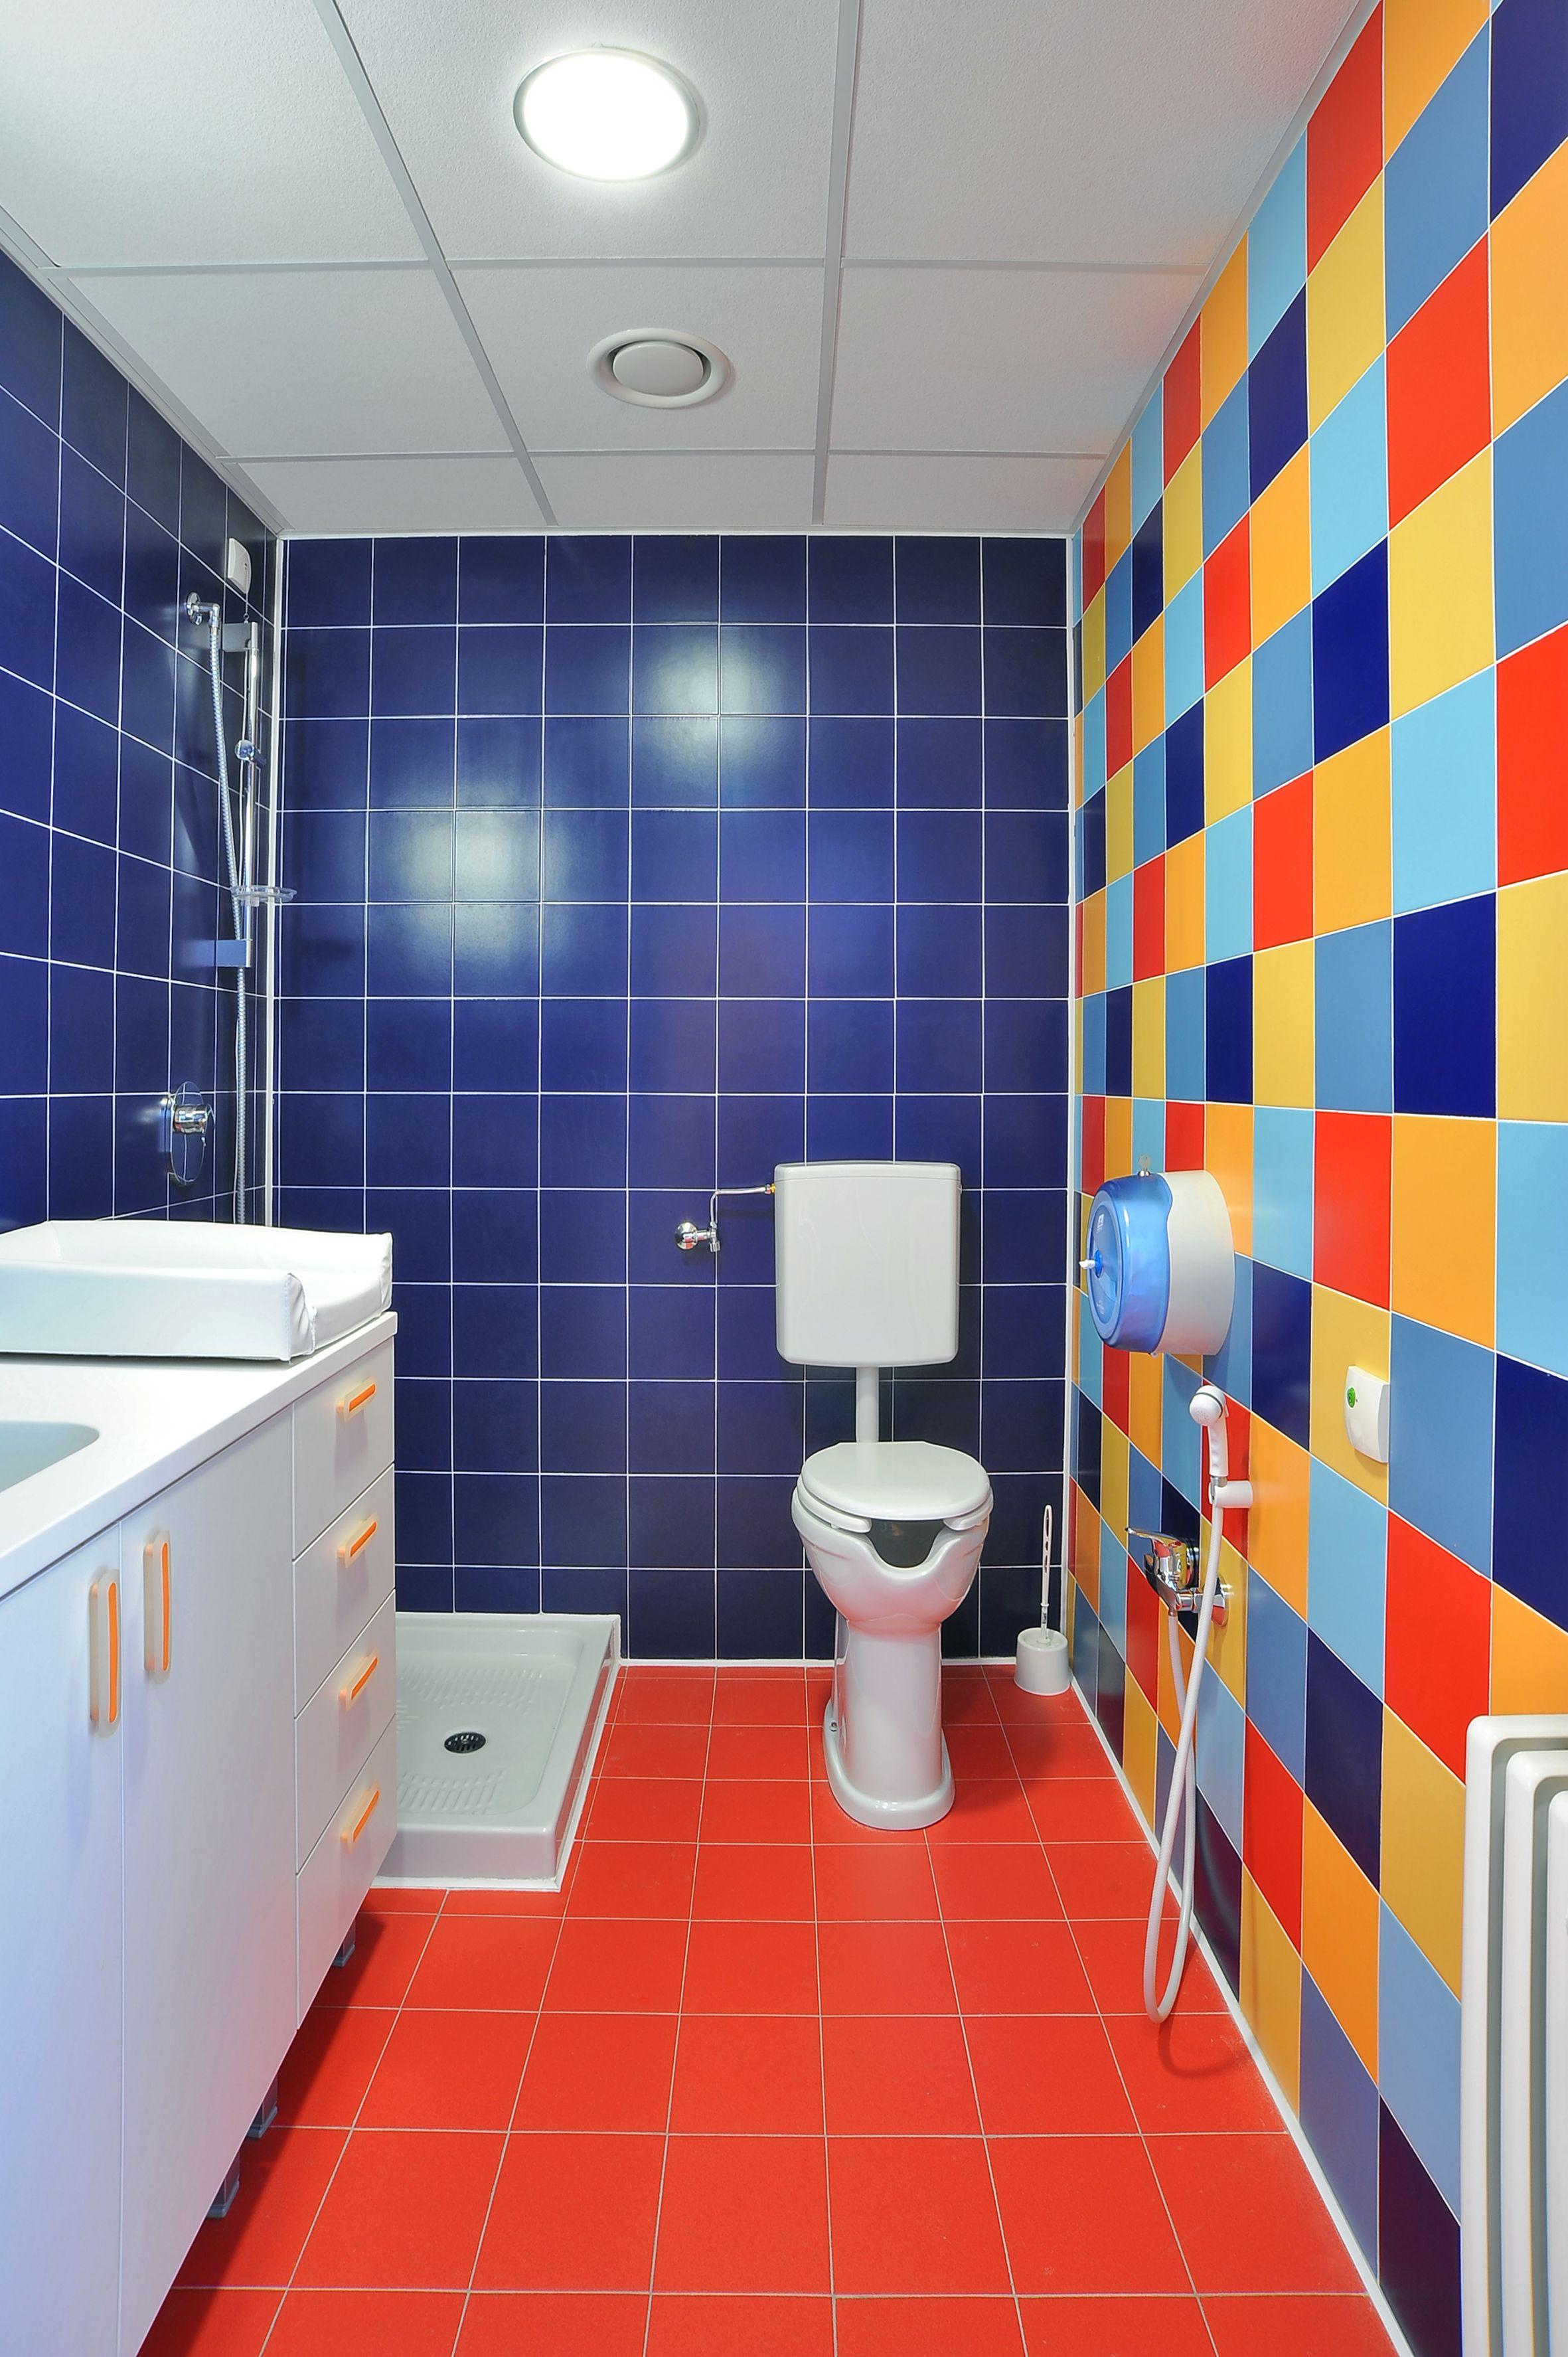 Ceramica vogue serie interni e flooring nuovo reparto for Ceramica vogue